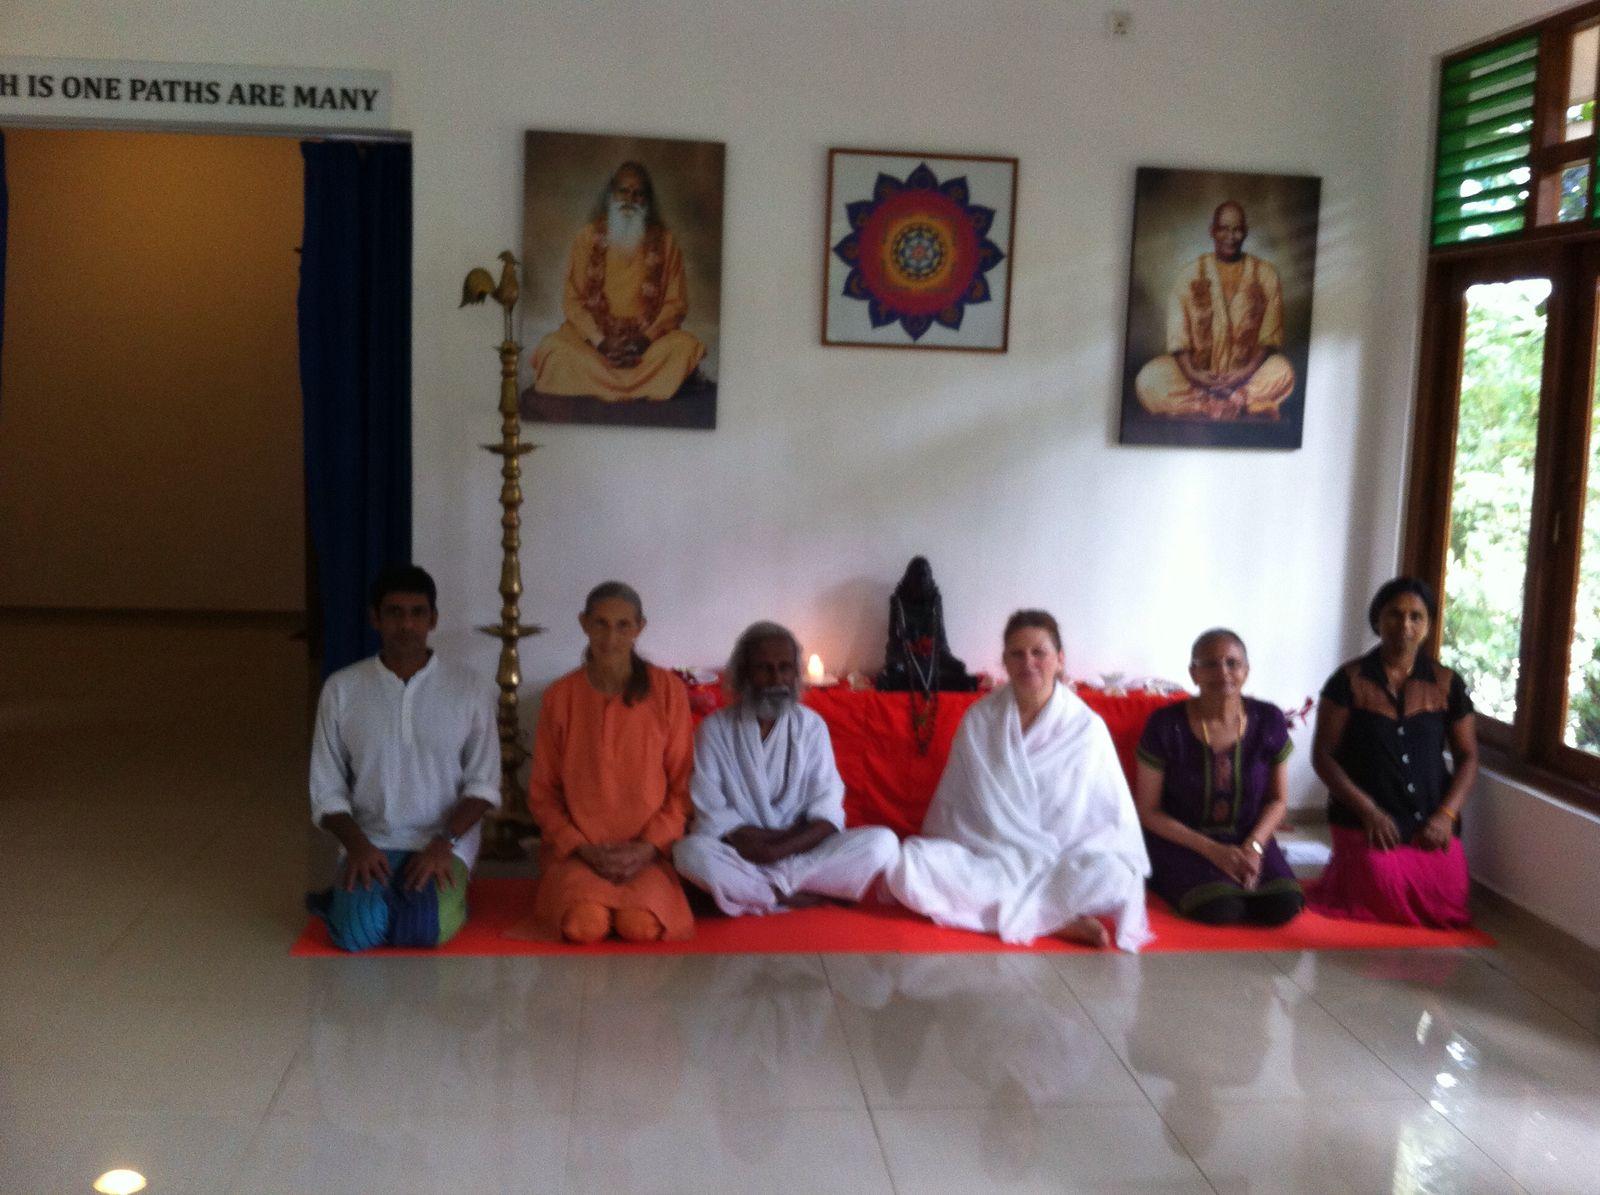 All Faiths Hall at Sachidananda Thapovanam, Kandy with Swami Divyananda Ma and Sri Kaliyuga